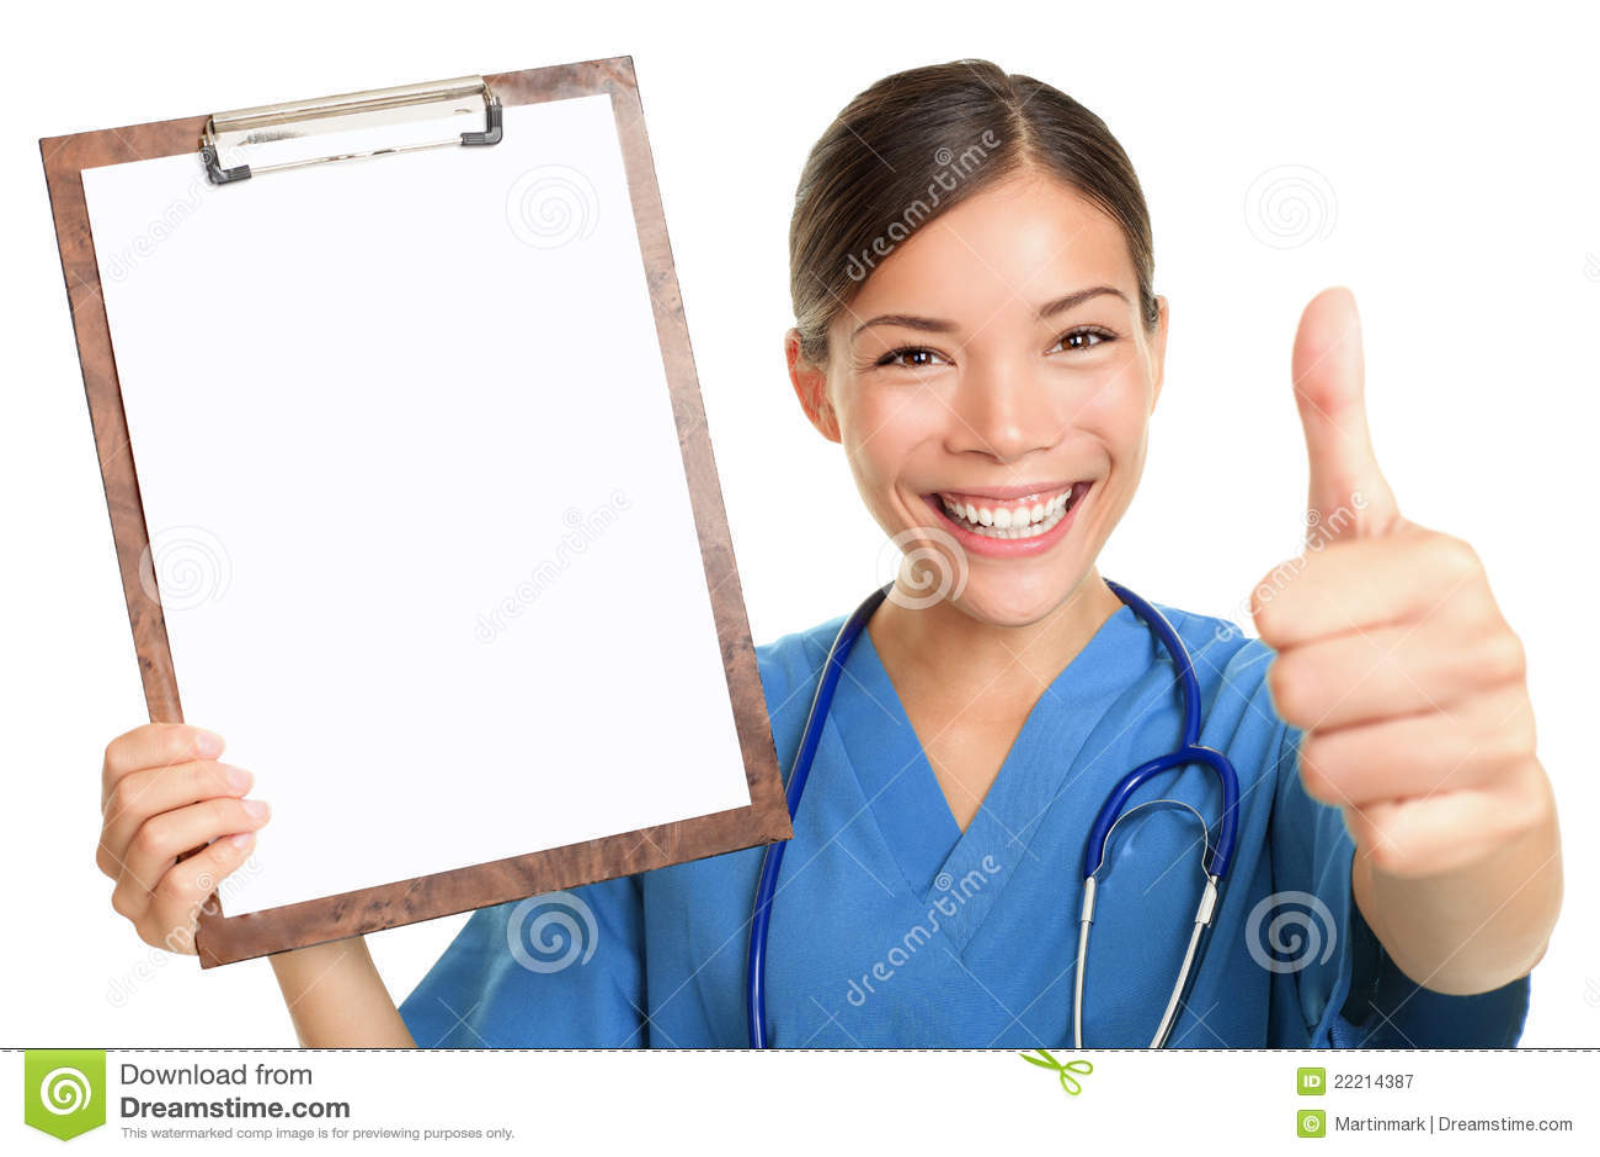 Nurse showing blank clipboard sign